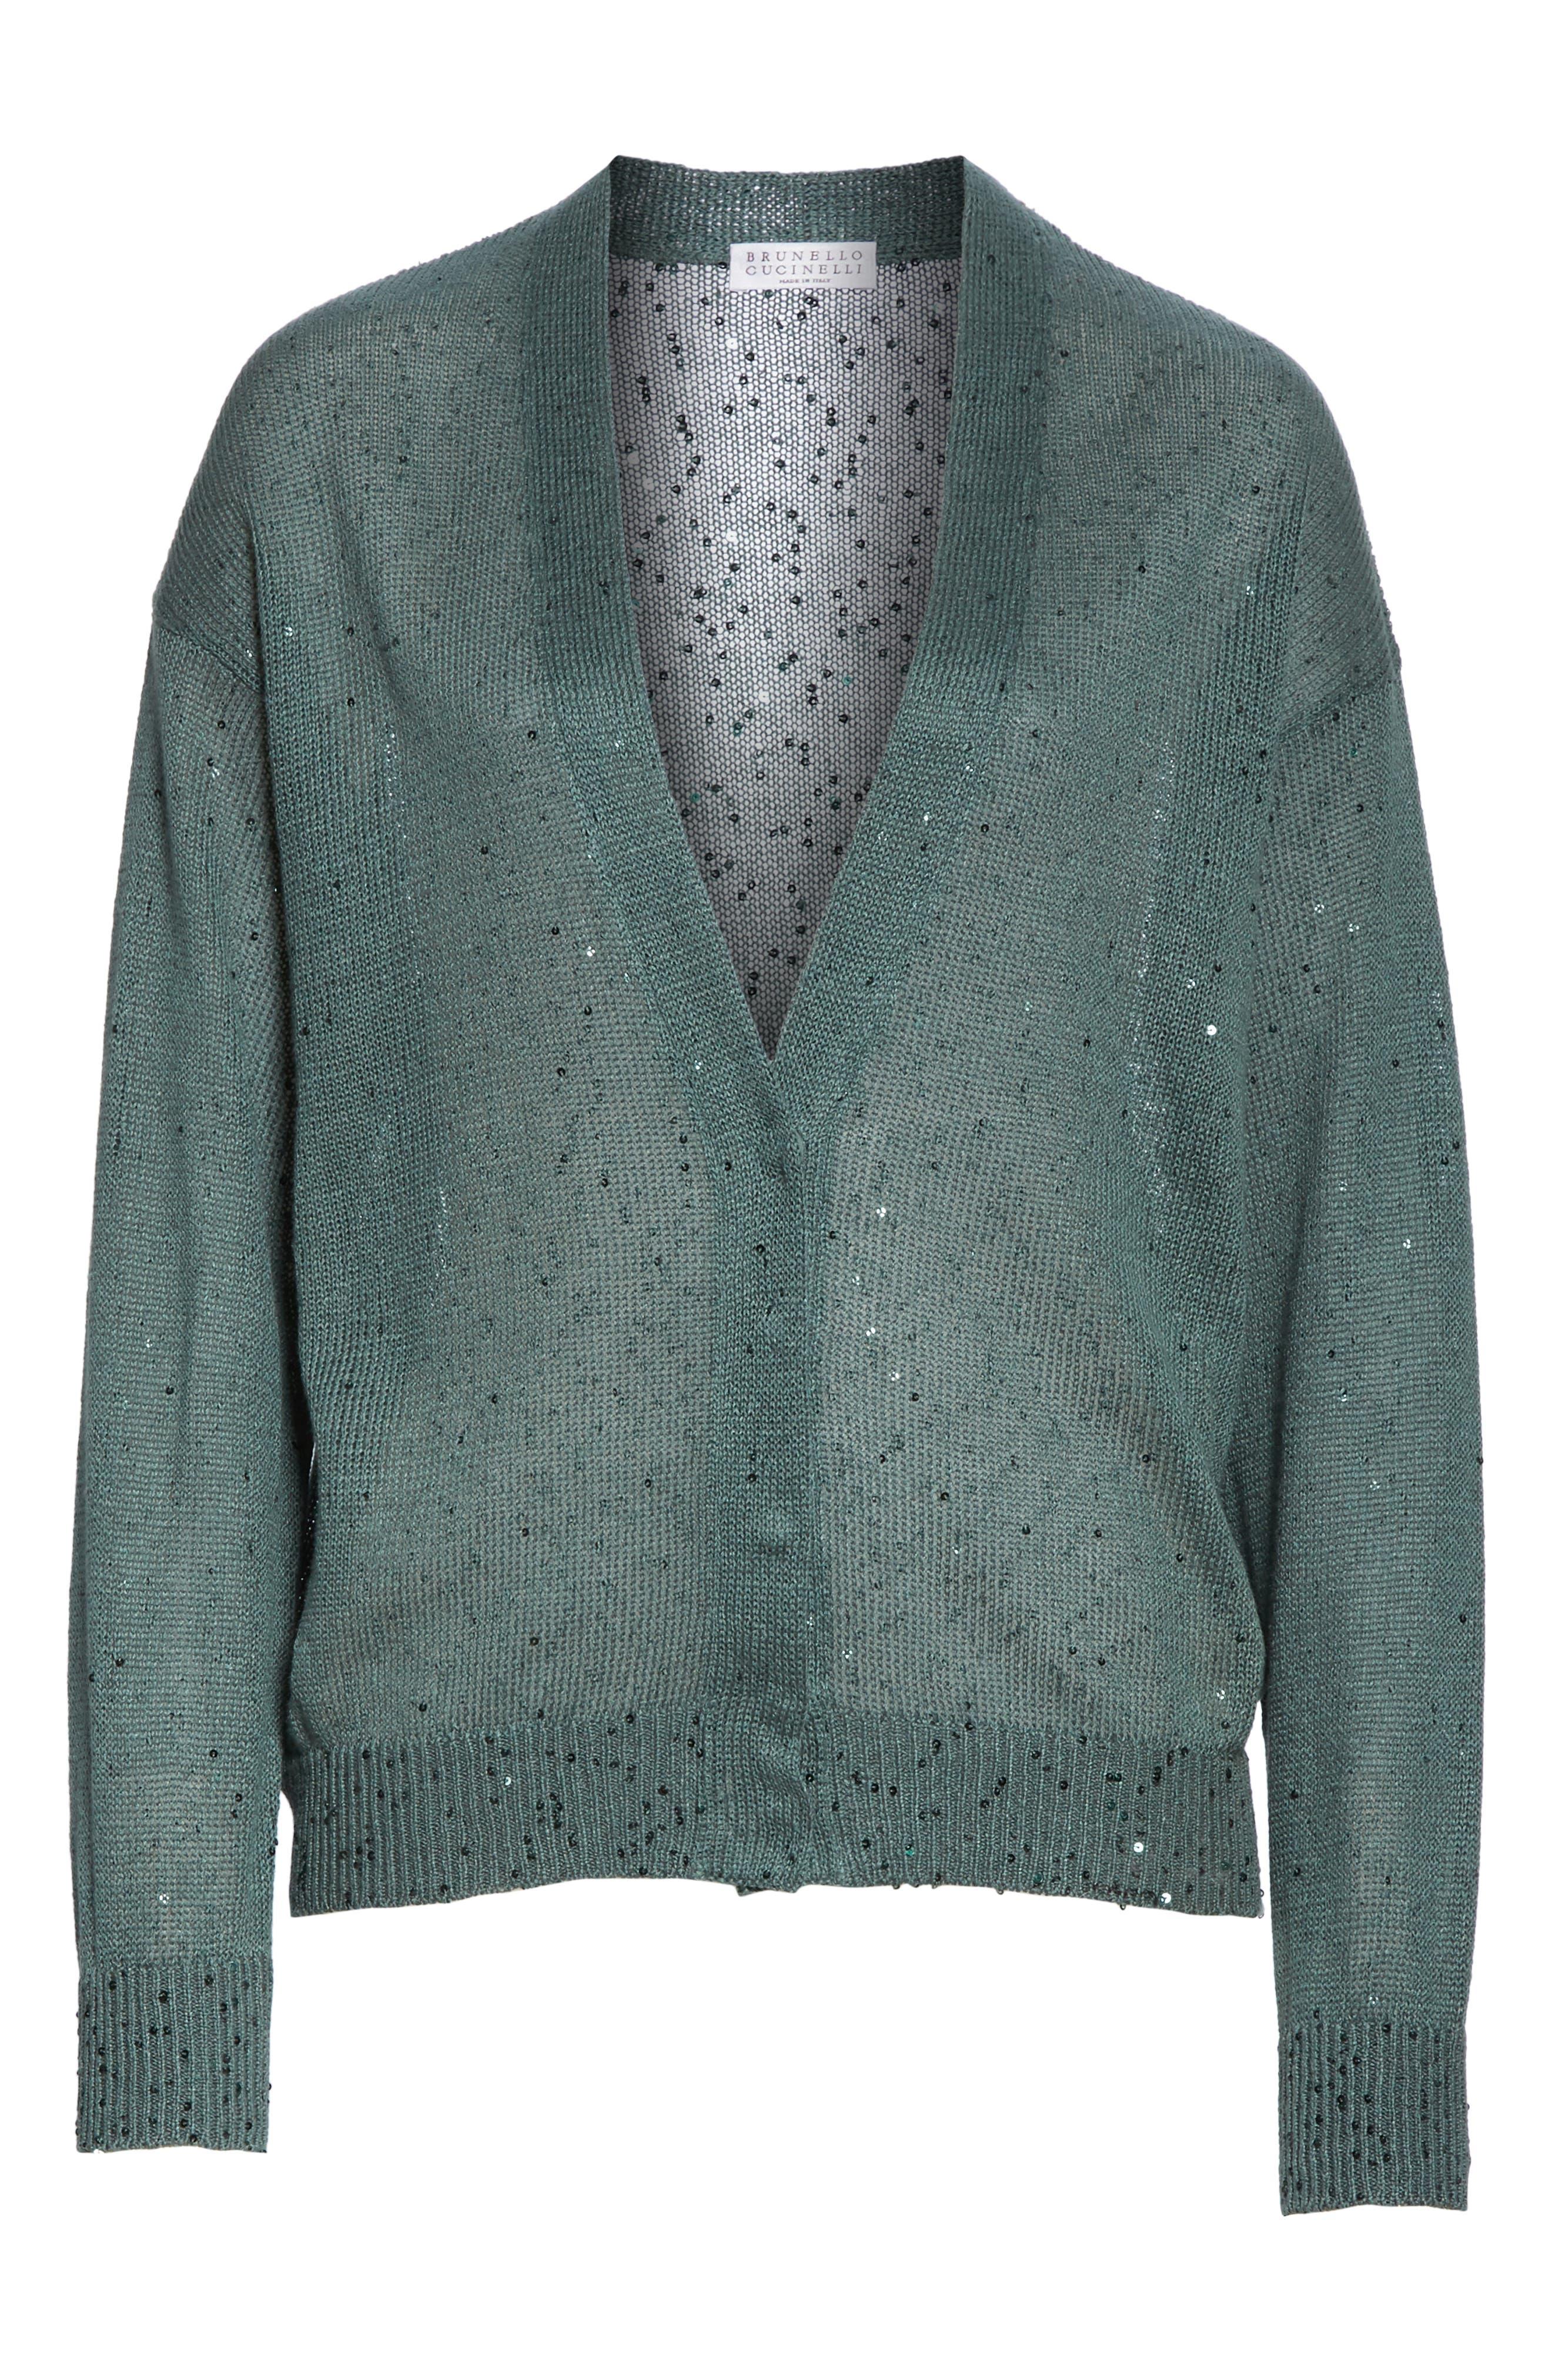 BRUNELLO CUCINELLI, Sequin Linen & Silk Cardigan, Alternate thumbnail 6, color, SAGE